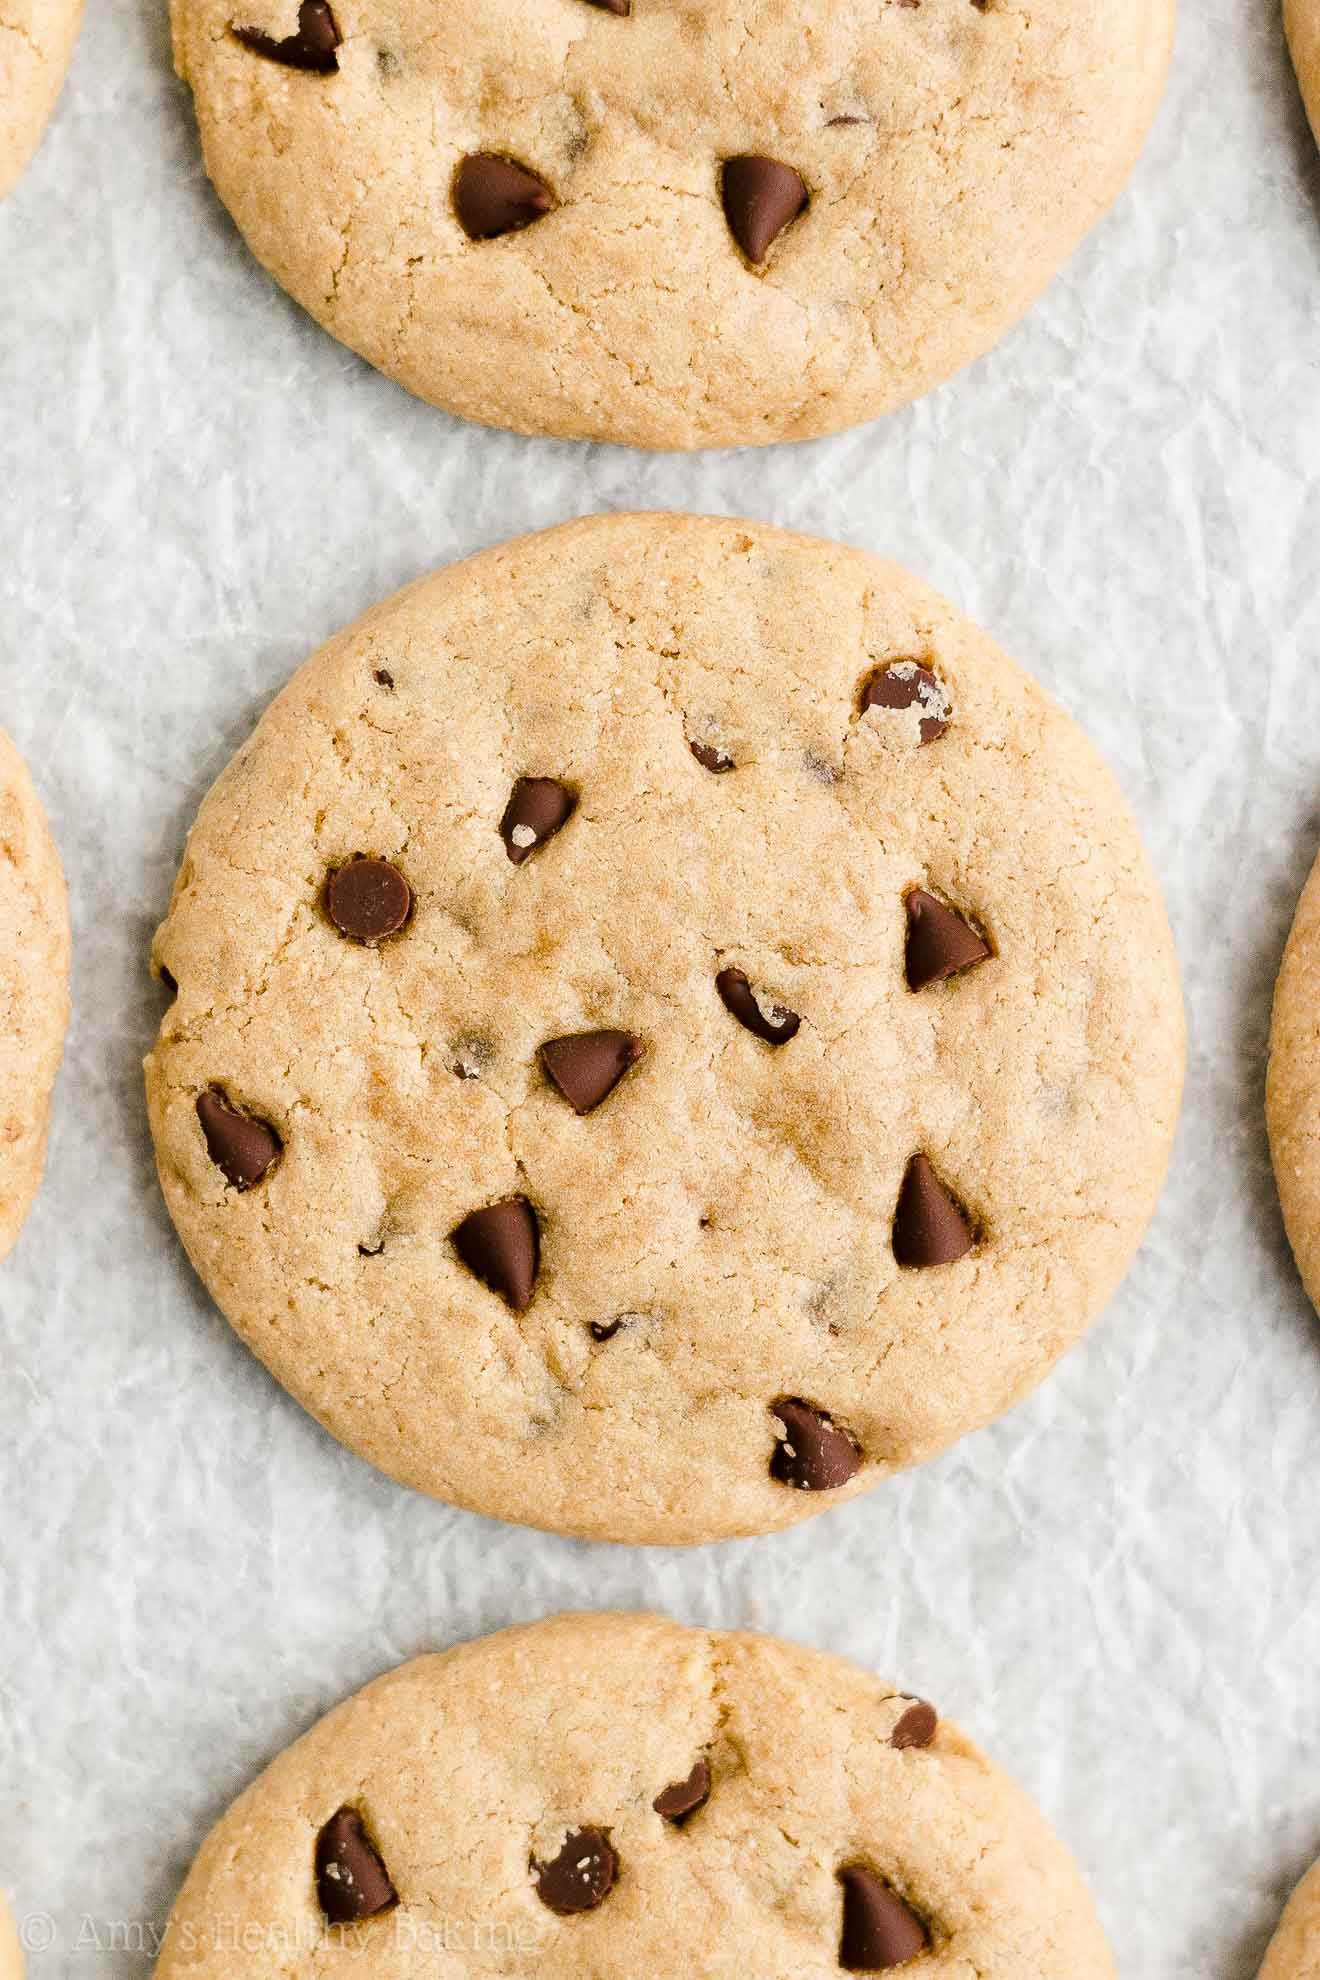 ULTIMATE Best Easy Healthy Vegan Chocolate Chip Peanut Butter Cookies